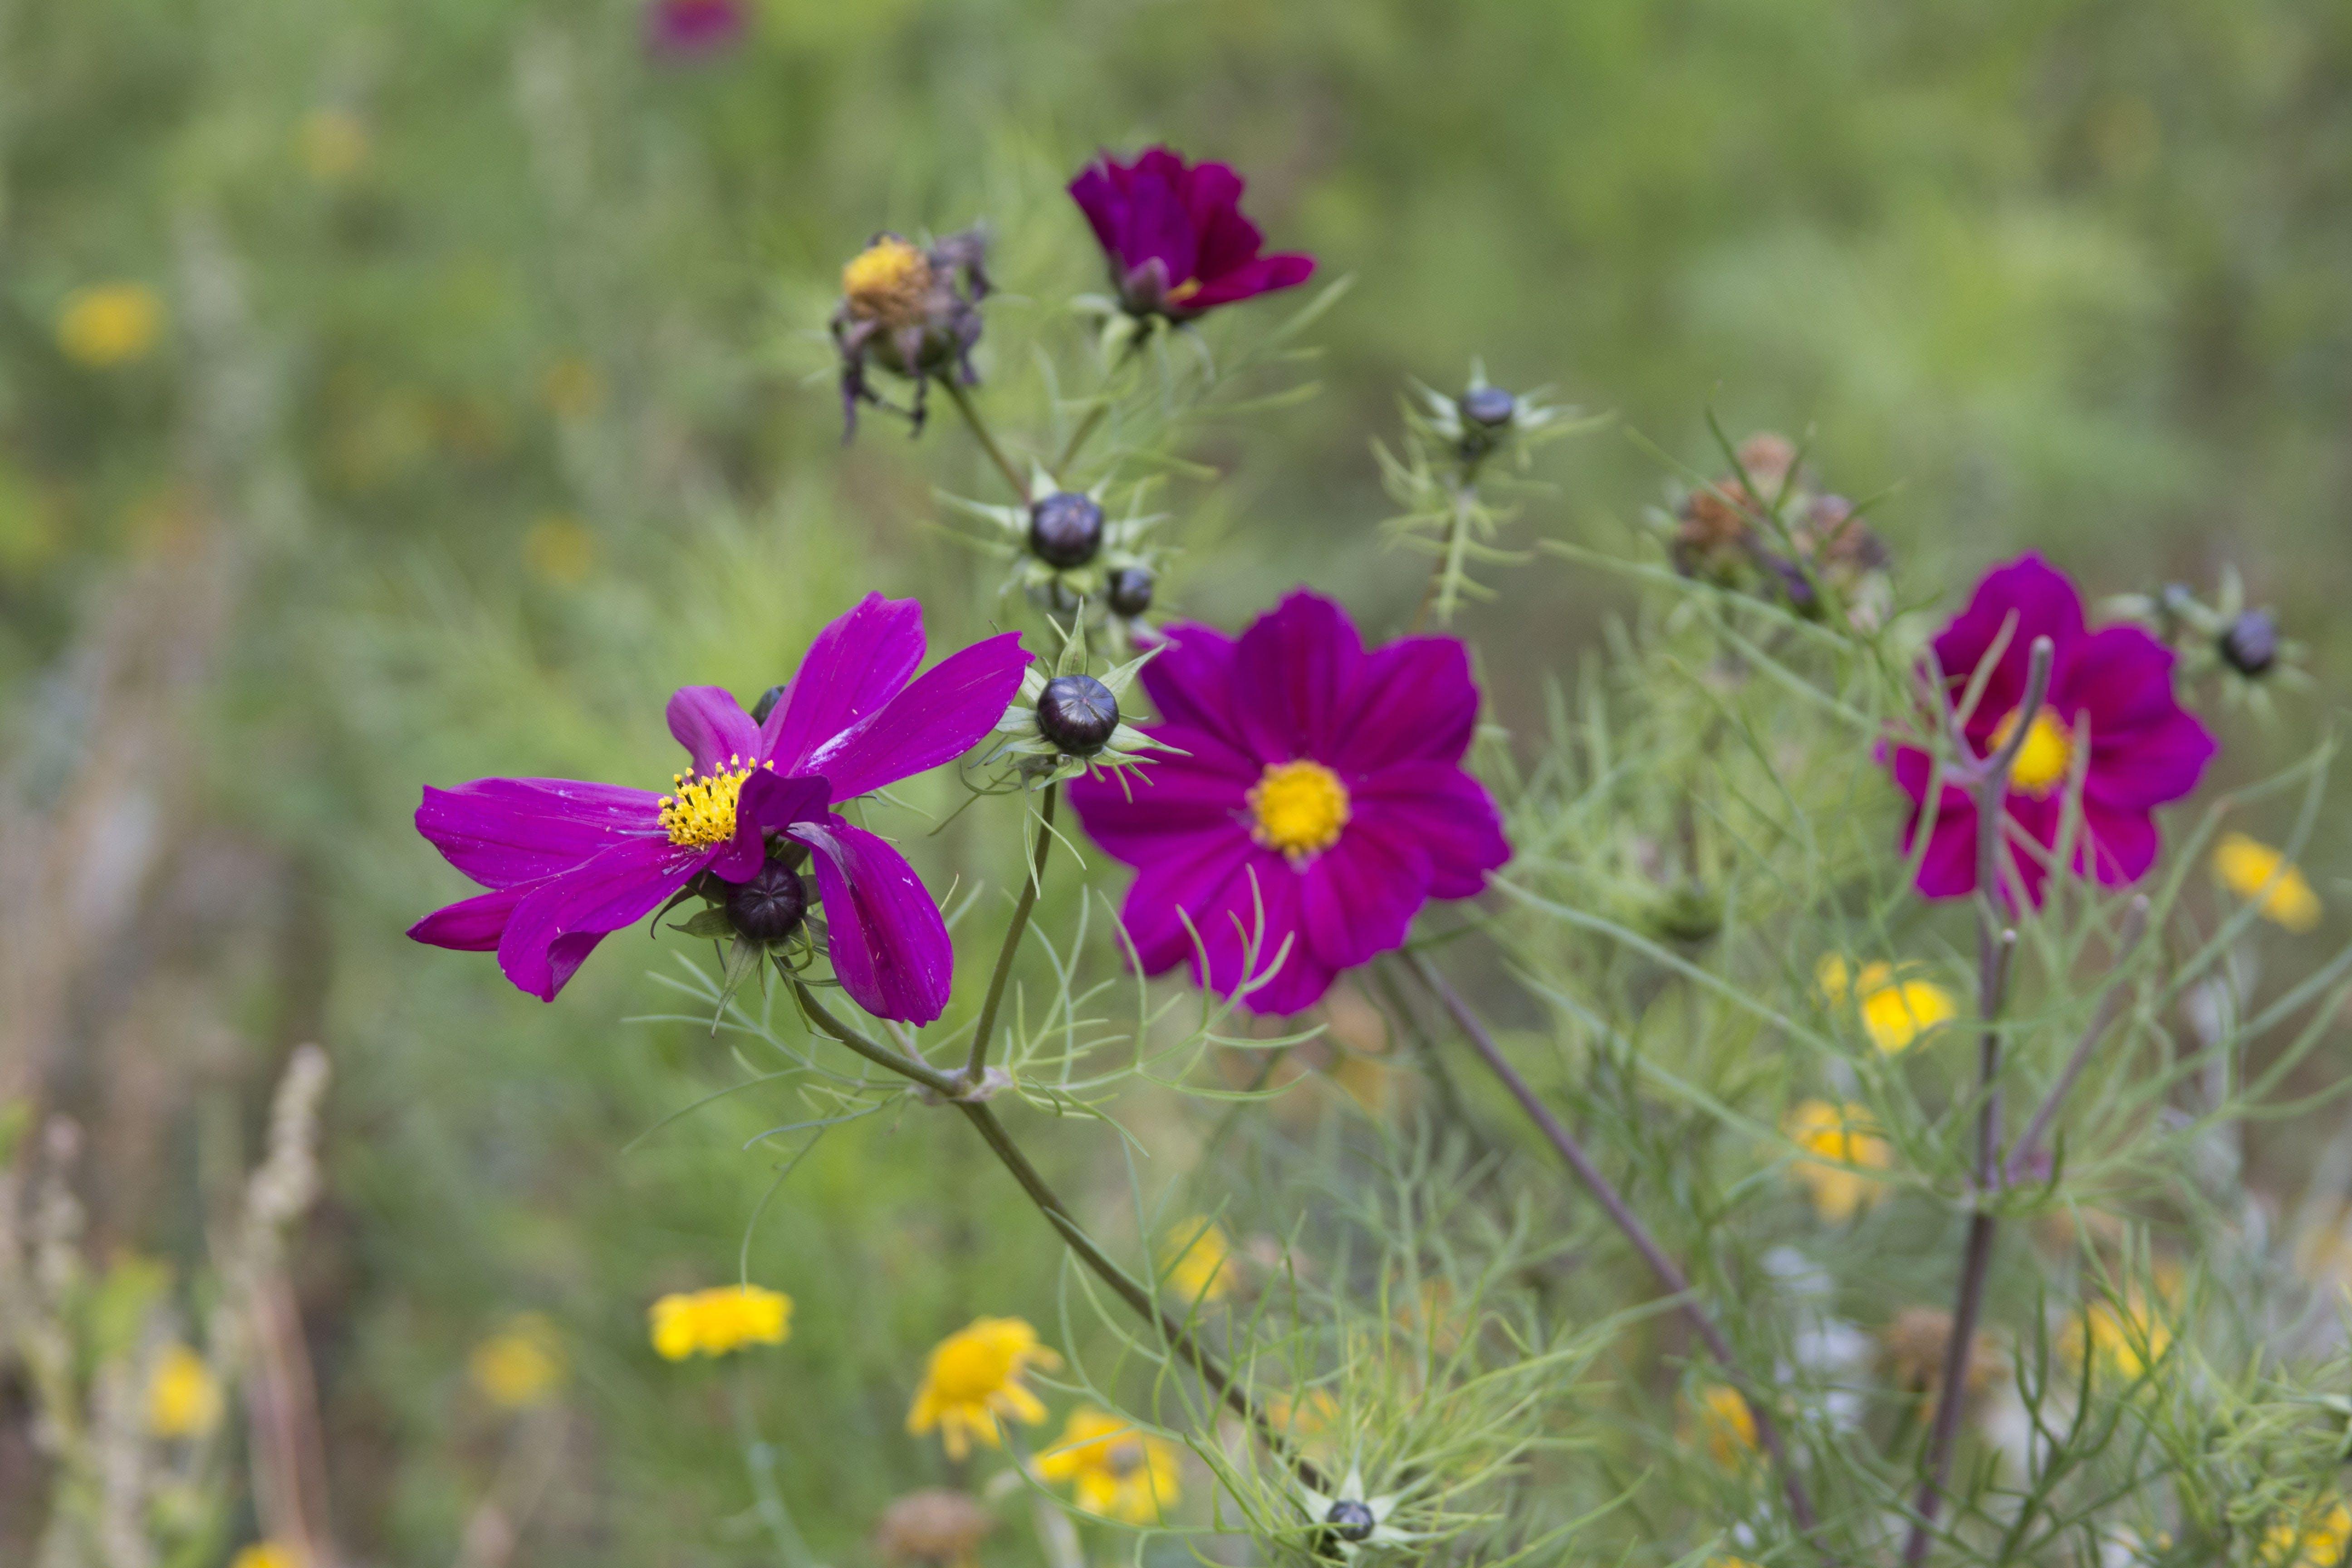 Free stock photo of flowers, macro photos, nature, outdoors